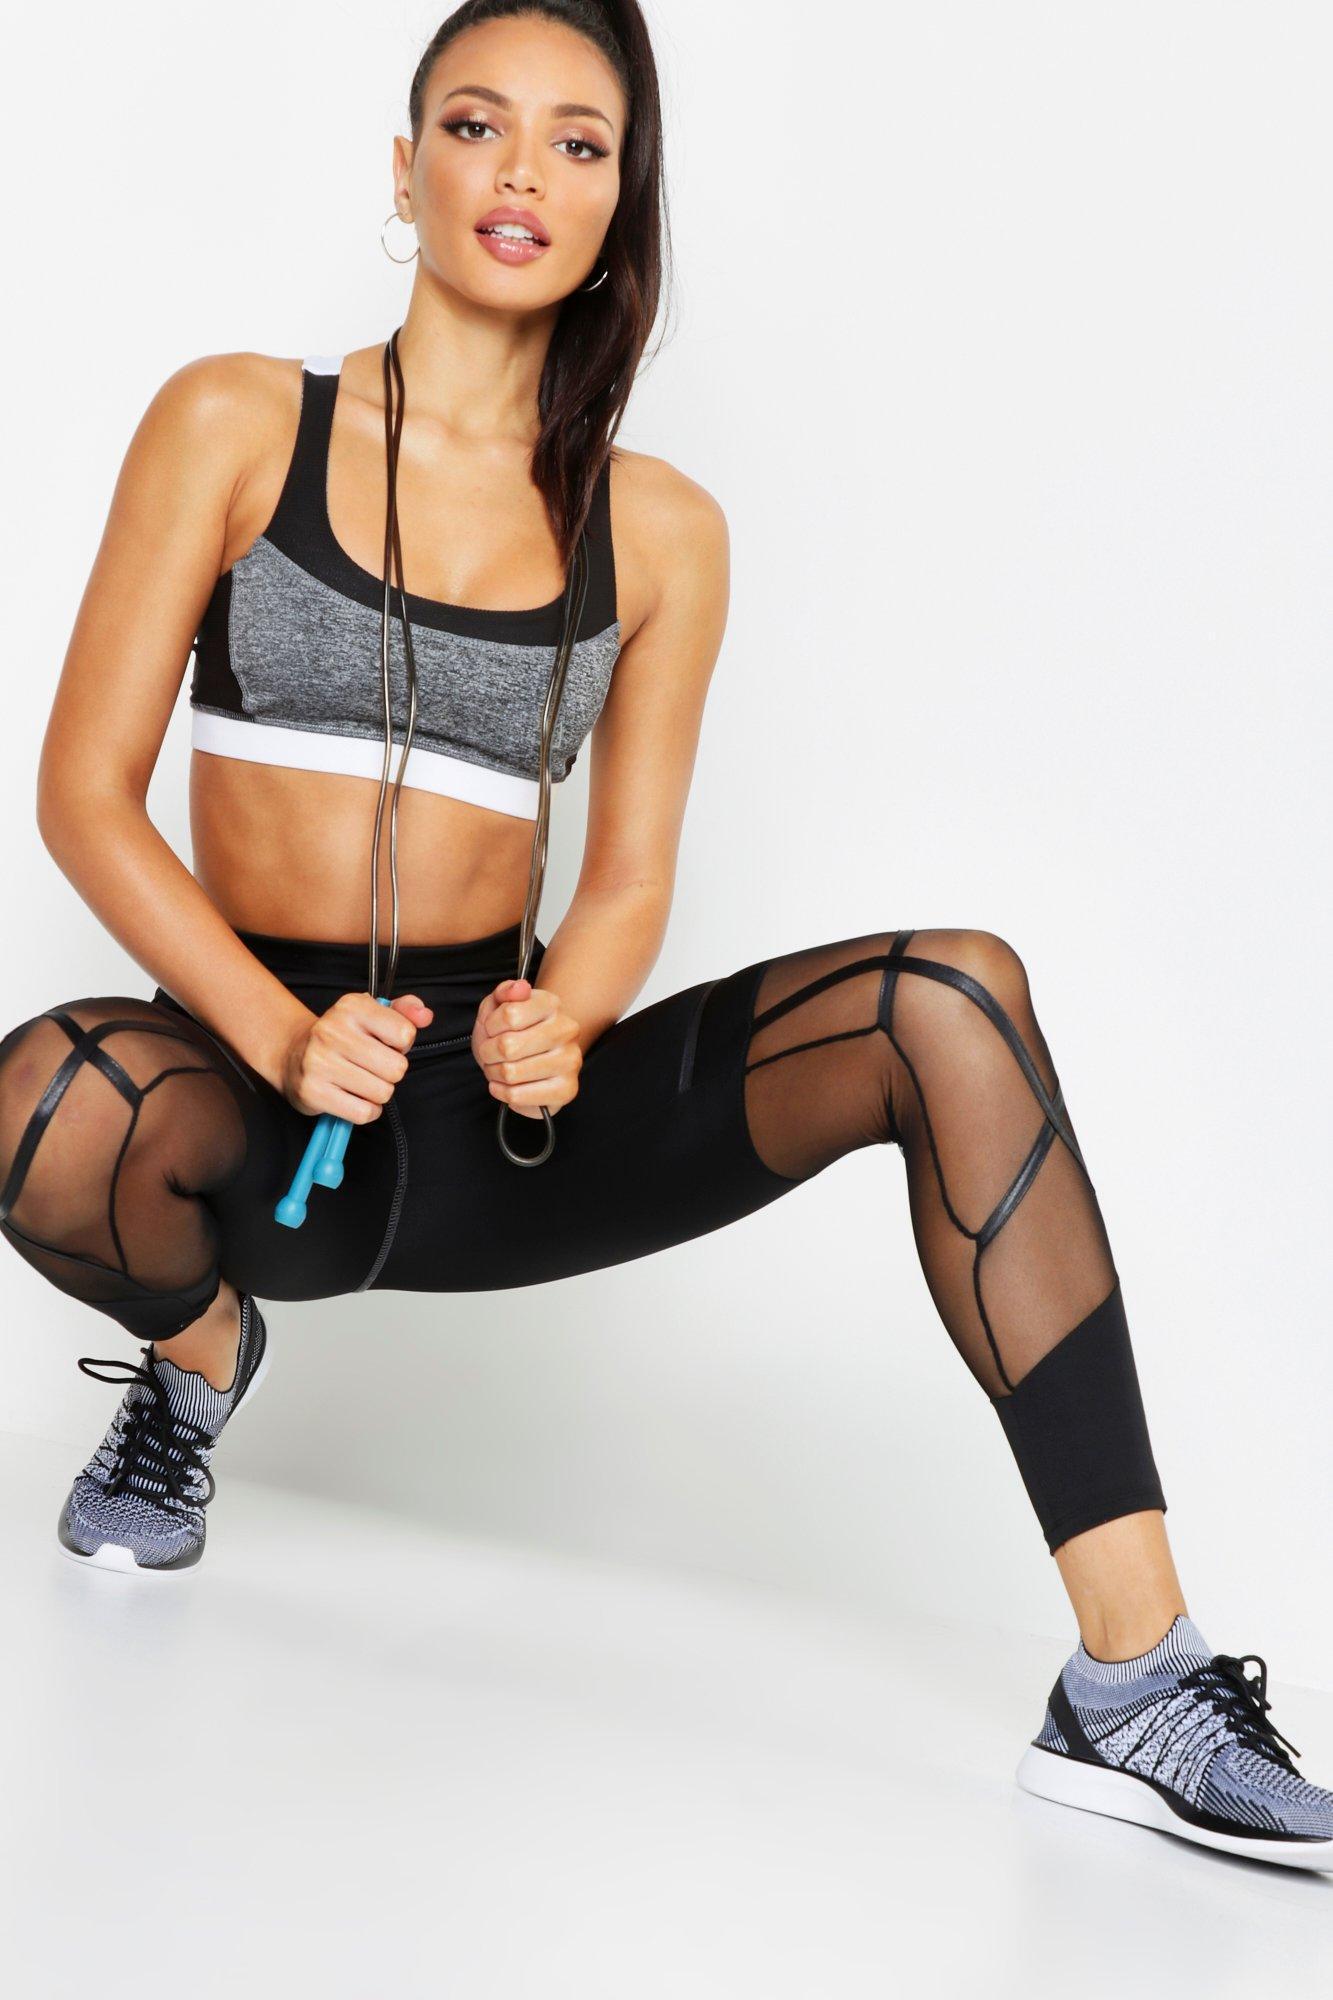 58af994698a72 Boohoo Fit Premium Panel Legging in Black - Lyst